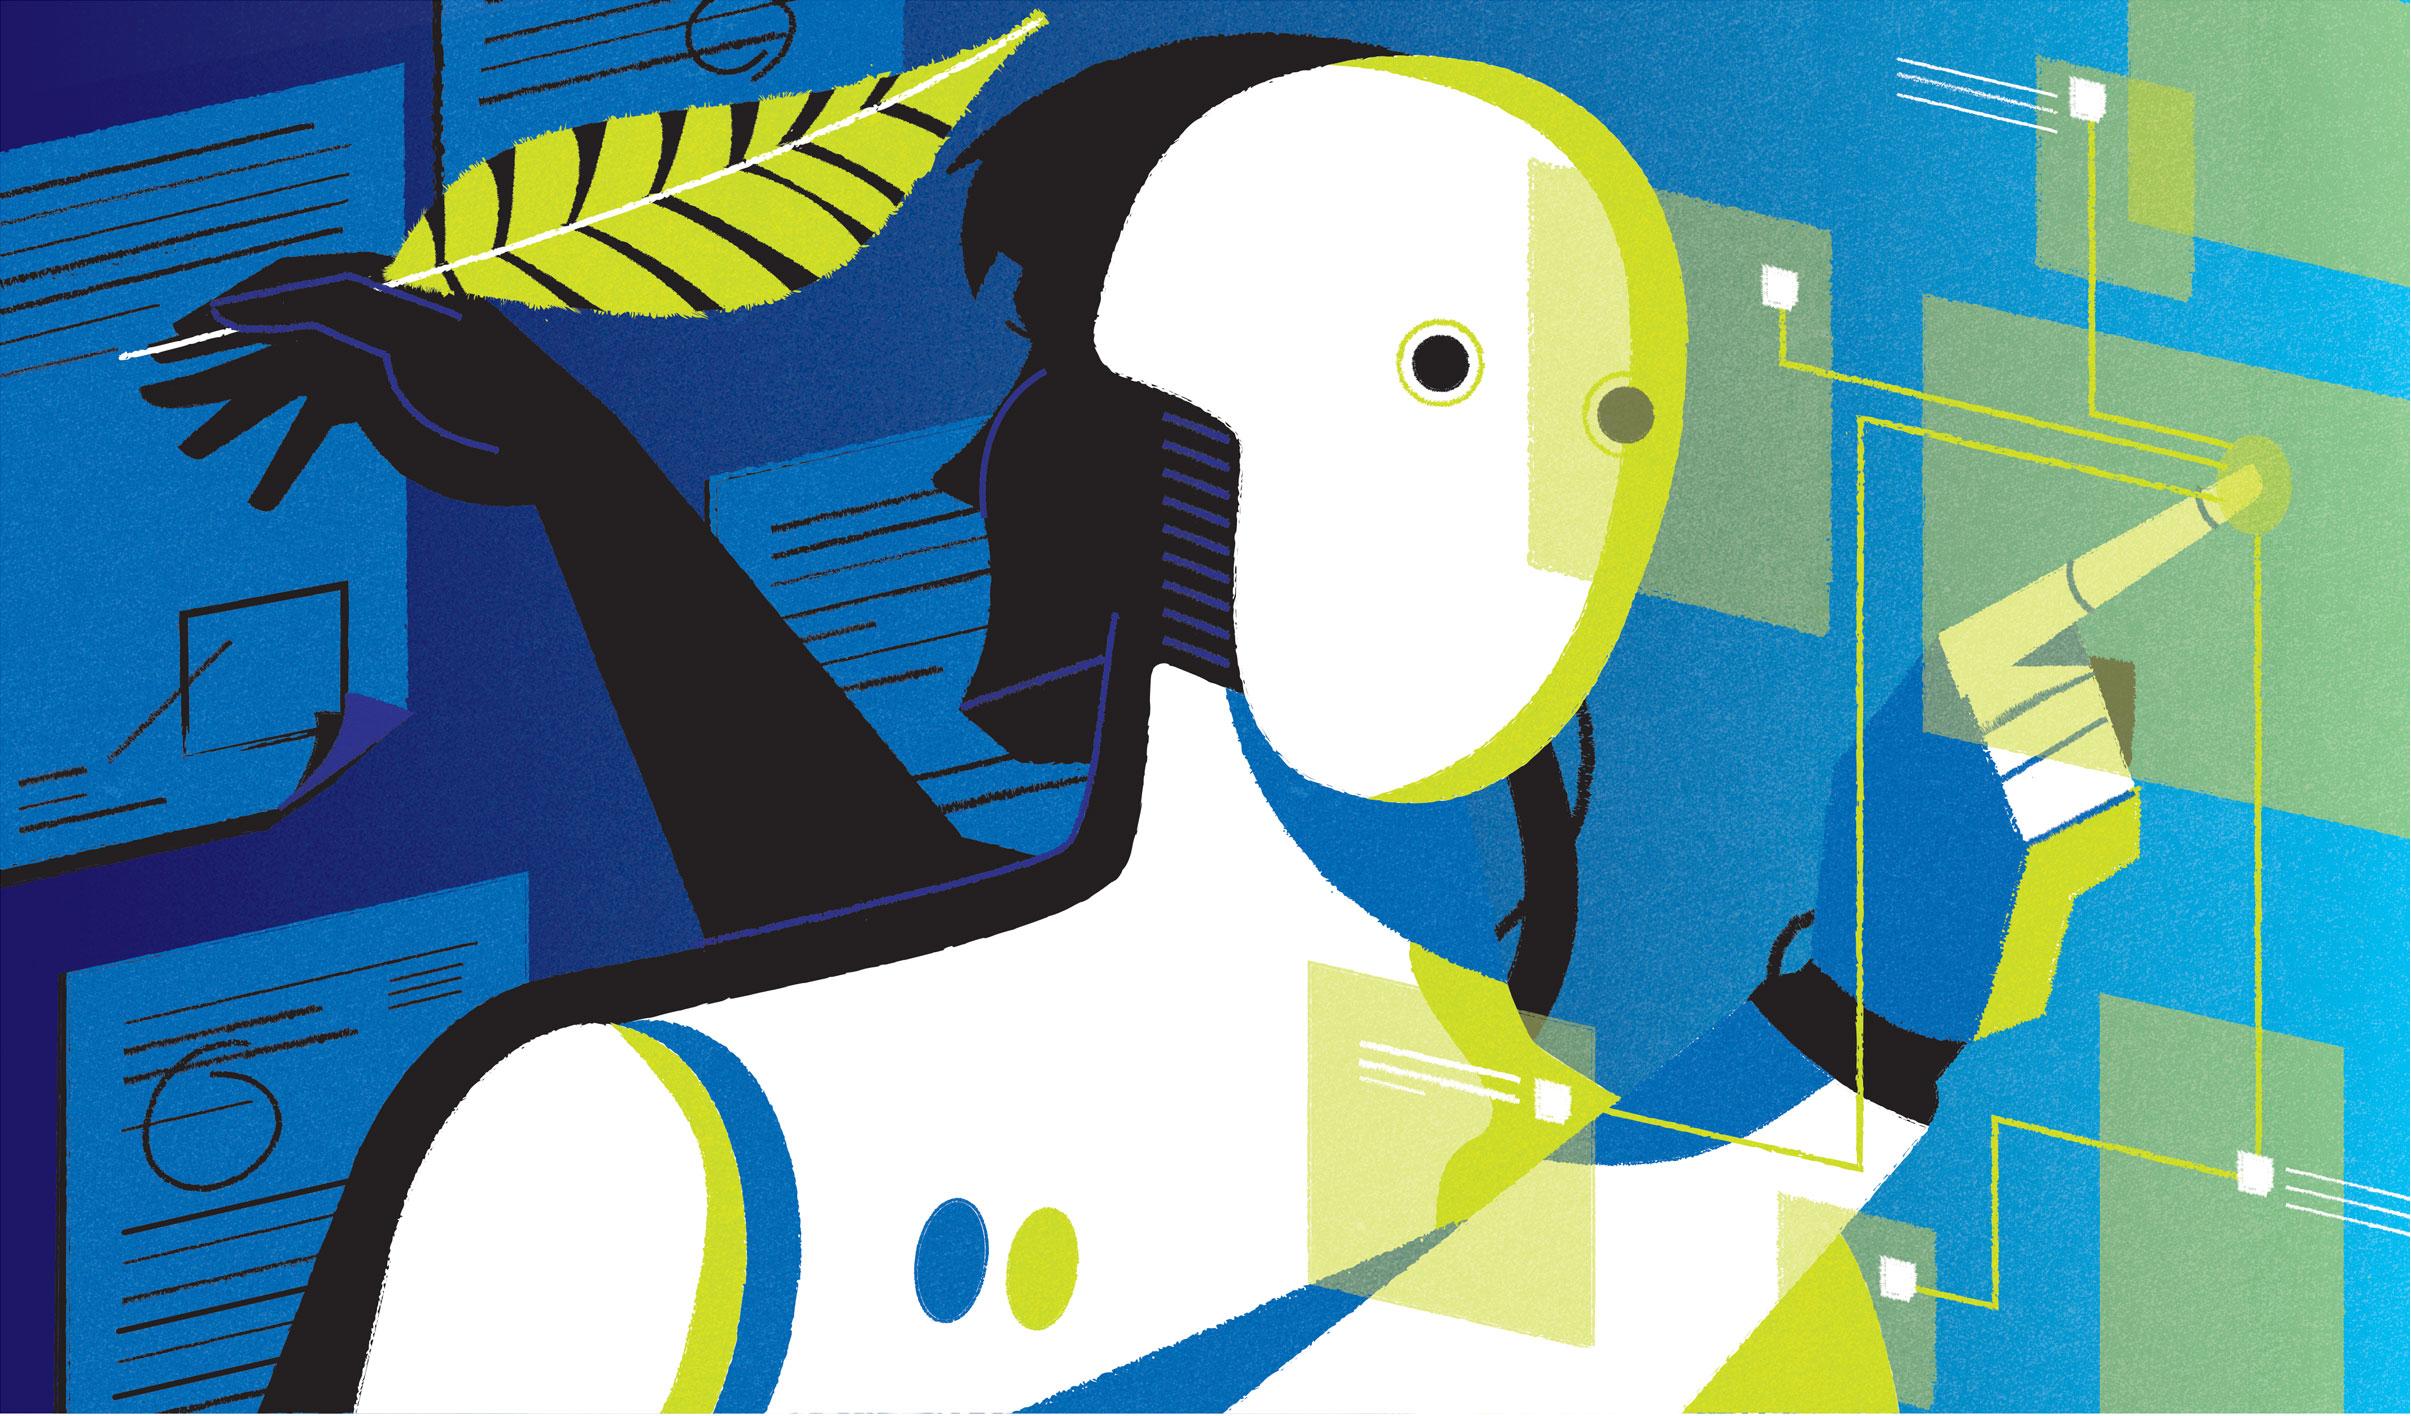 freelance illustrator dale edwin murray editorial conceptual illustration times higher education